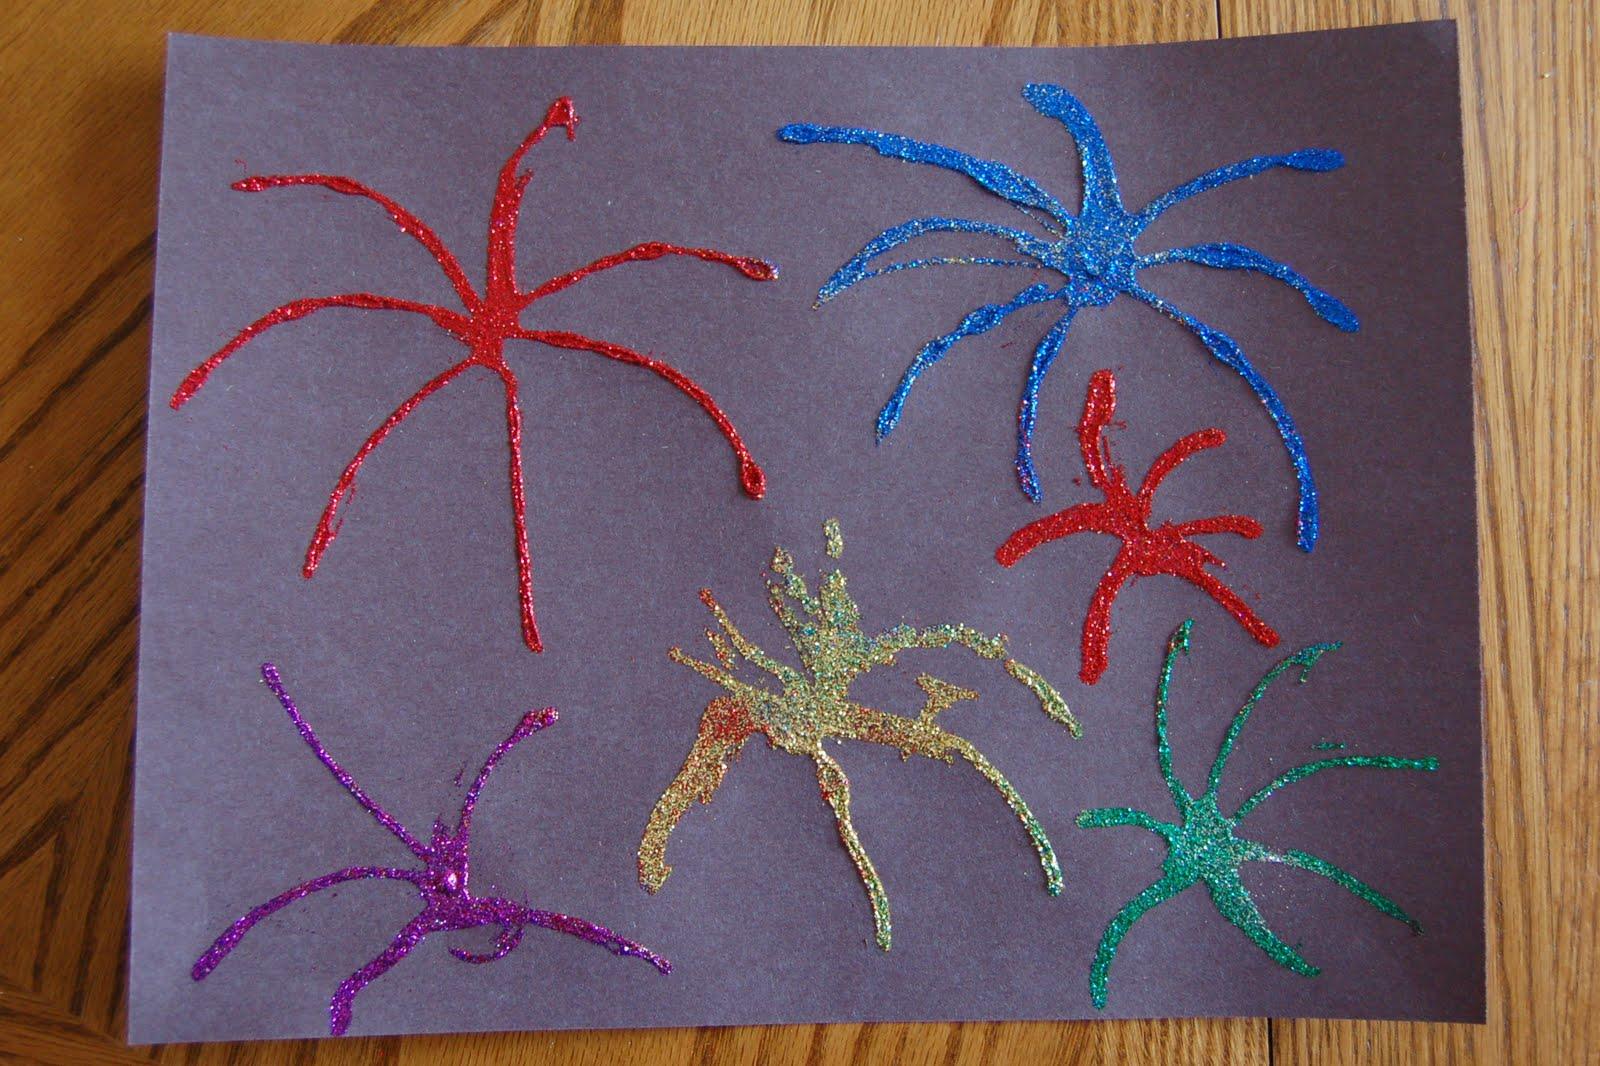 Preschool Crafts For Kids 4th Of July Glitter Fireworks